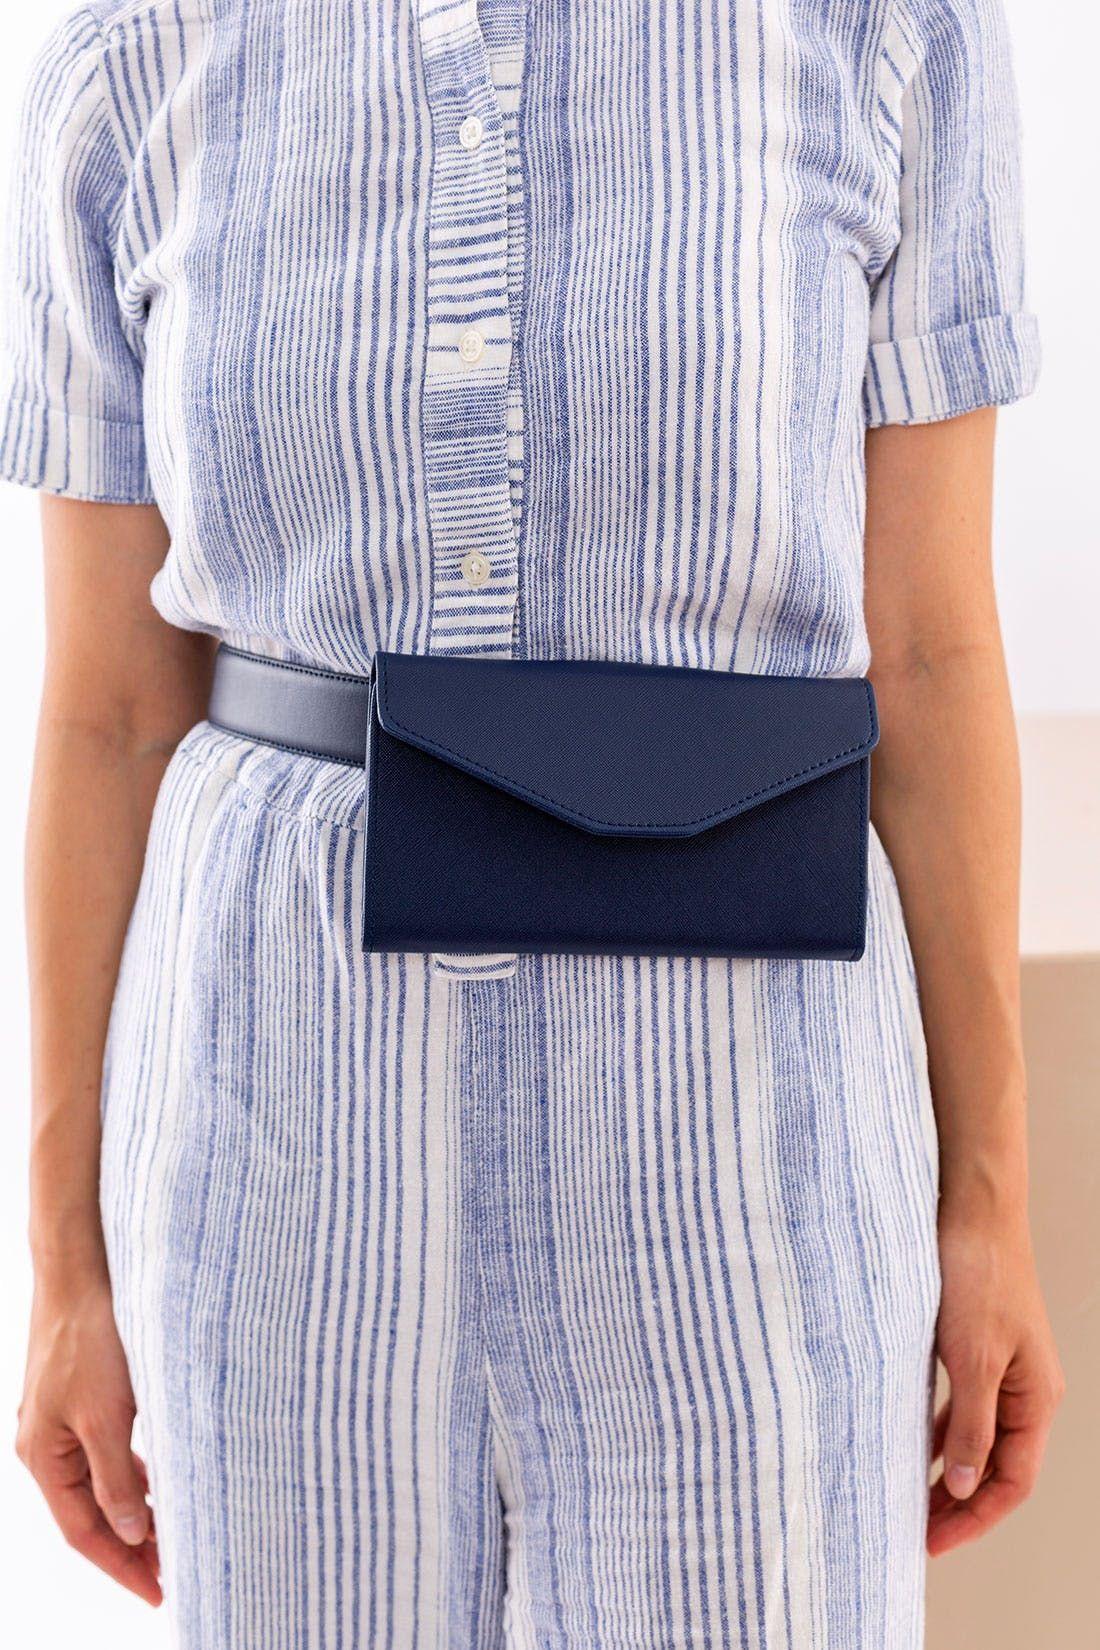 dc4cf0116bd DIY Trendy Belt Bag: Easy Tutorial | feeling crafty | Diy bag belt ...